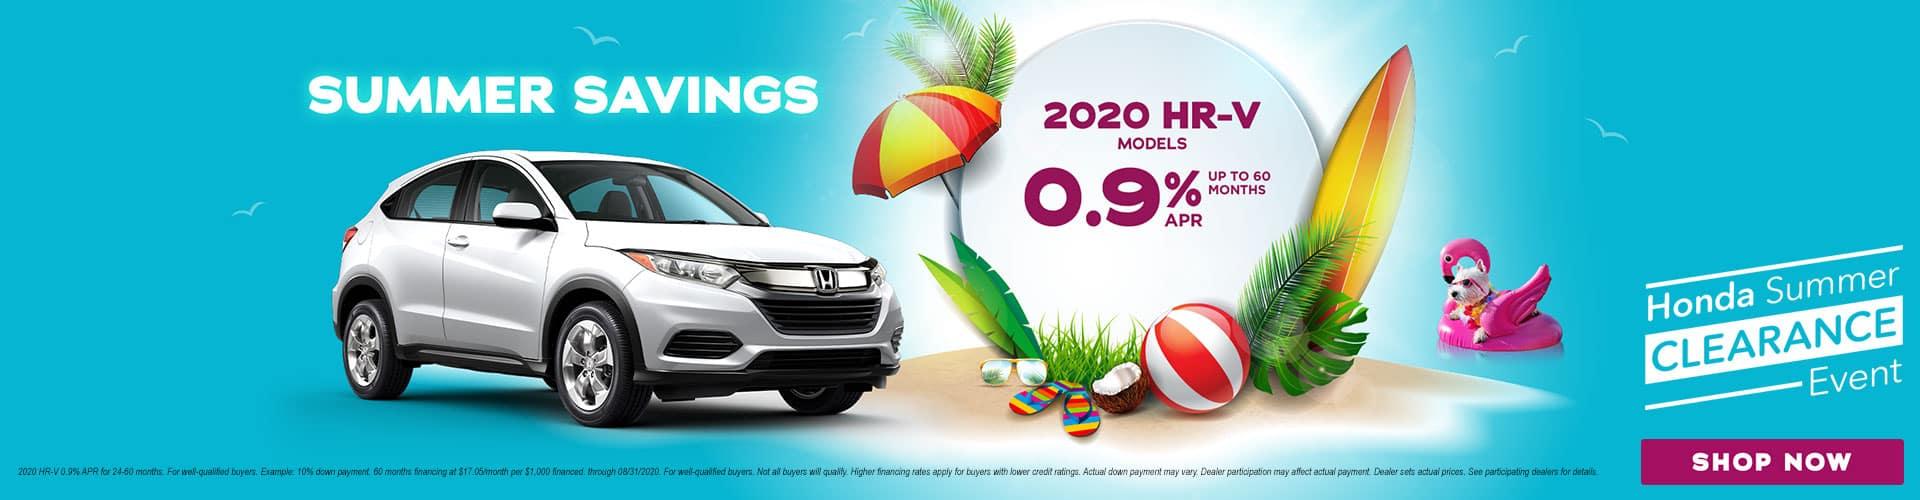 Honda Clearance HRV Shop now